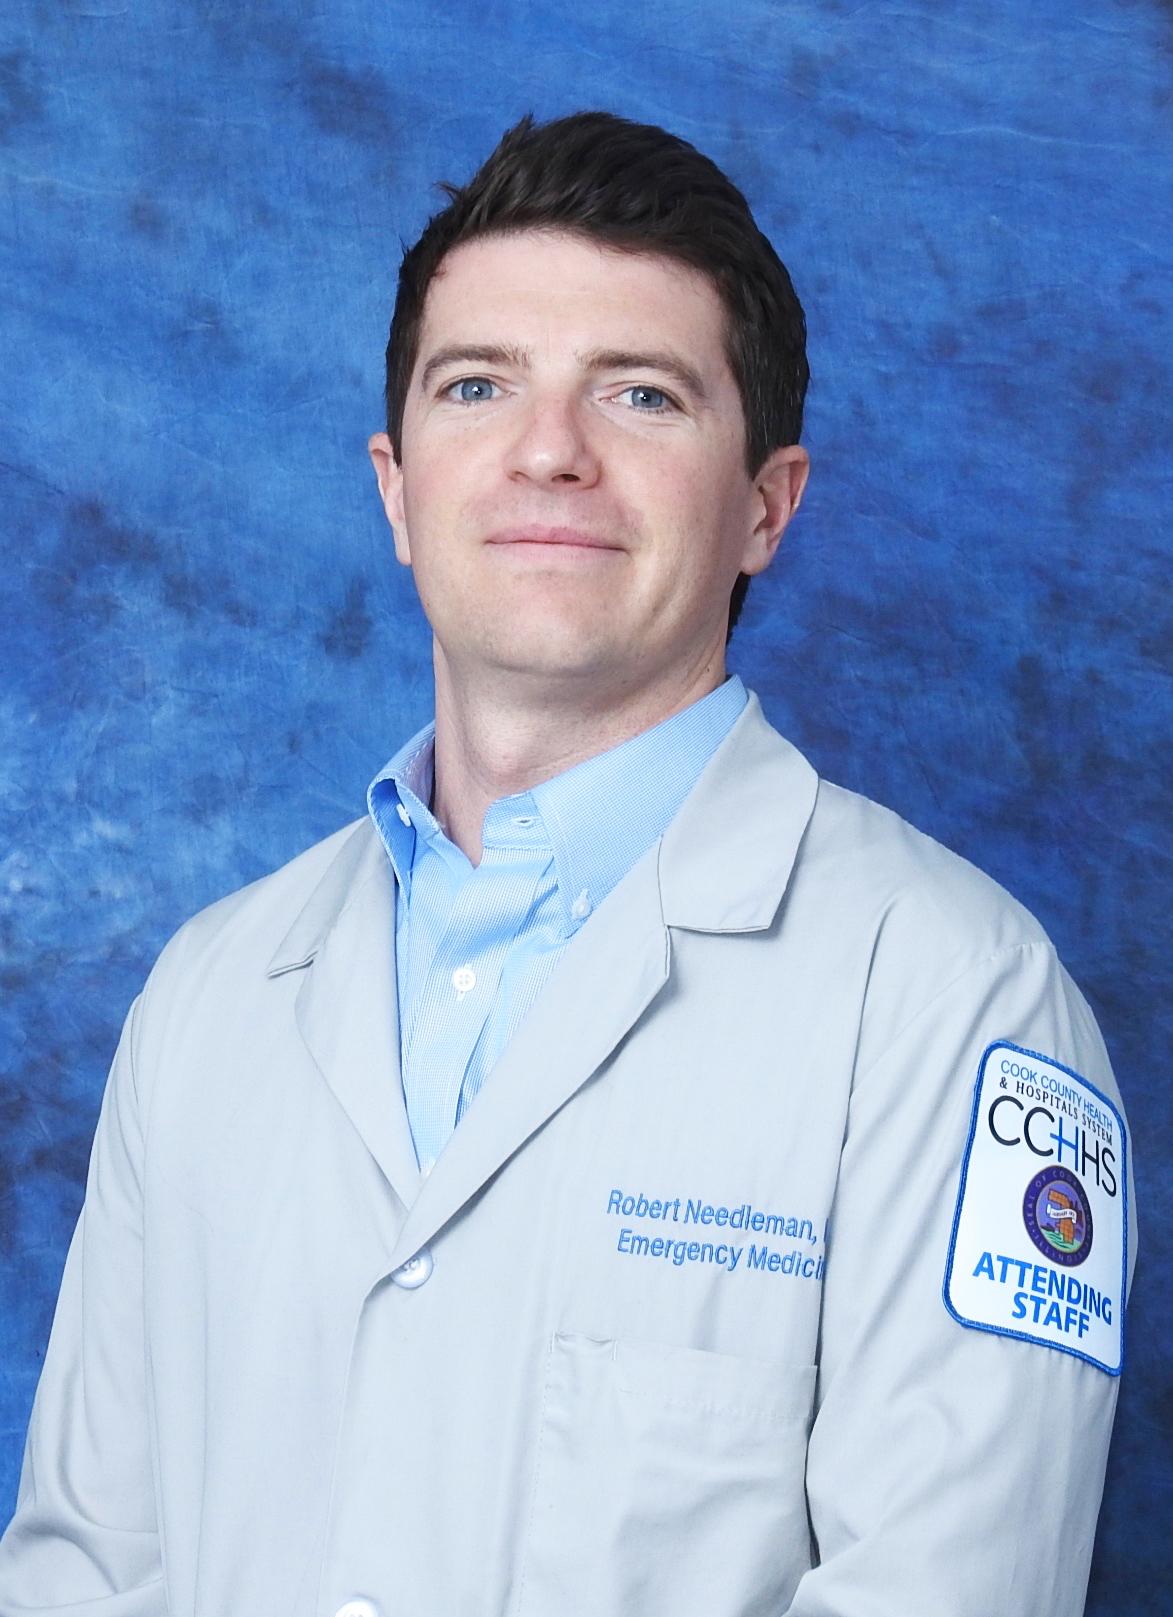 Robert K. Needleman, MD